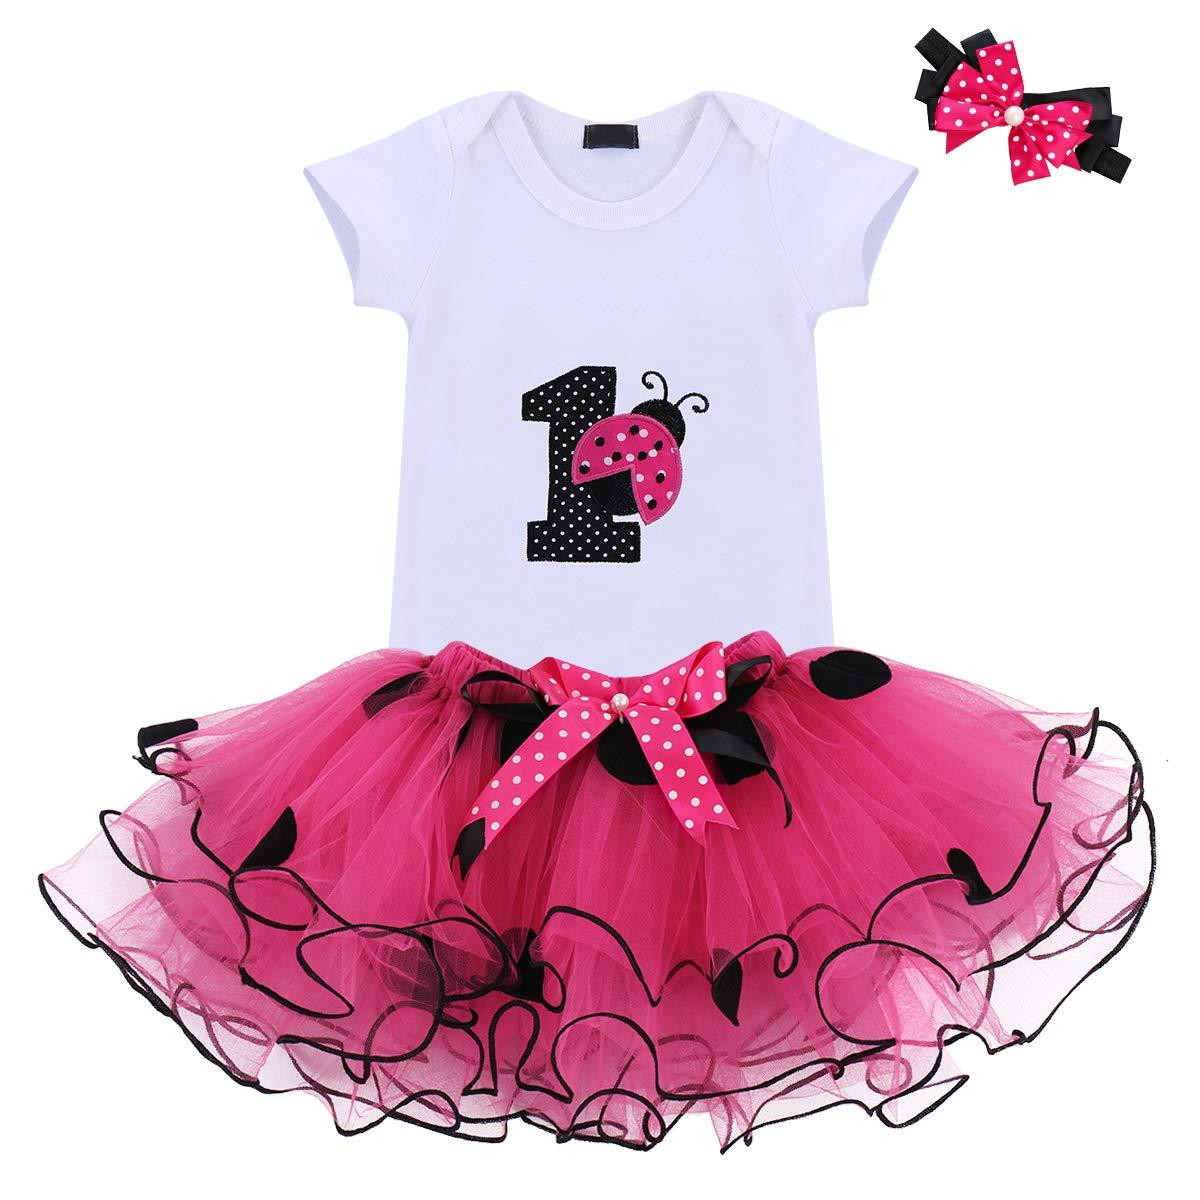 4b73fea6 Amazon.com: Baby Girls 1st Birthday Cake Smash 3pcs Outfits Set Cotton  Romper Bodysuit+Tutu Dress+Flower Headband Princess Skirt Clothes (3pcs Hot  Pink ...